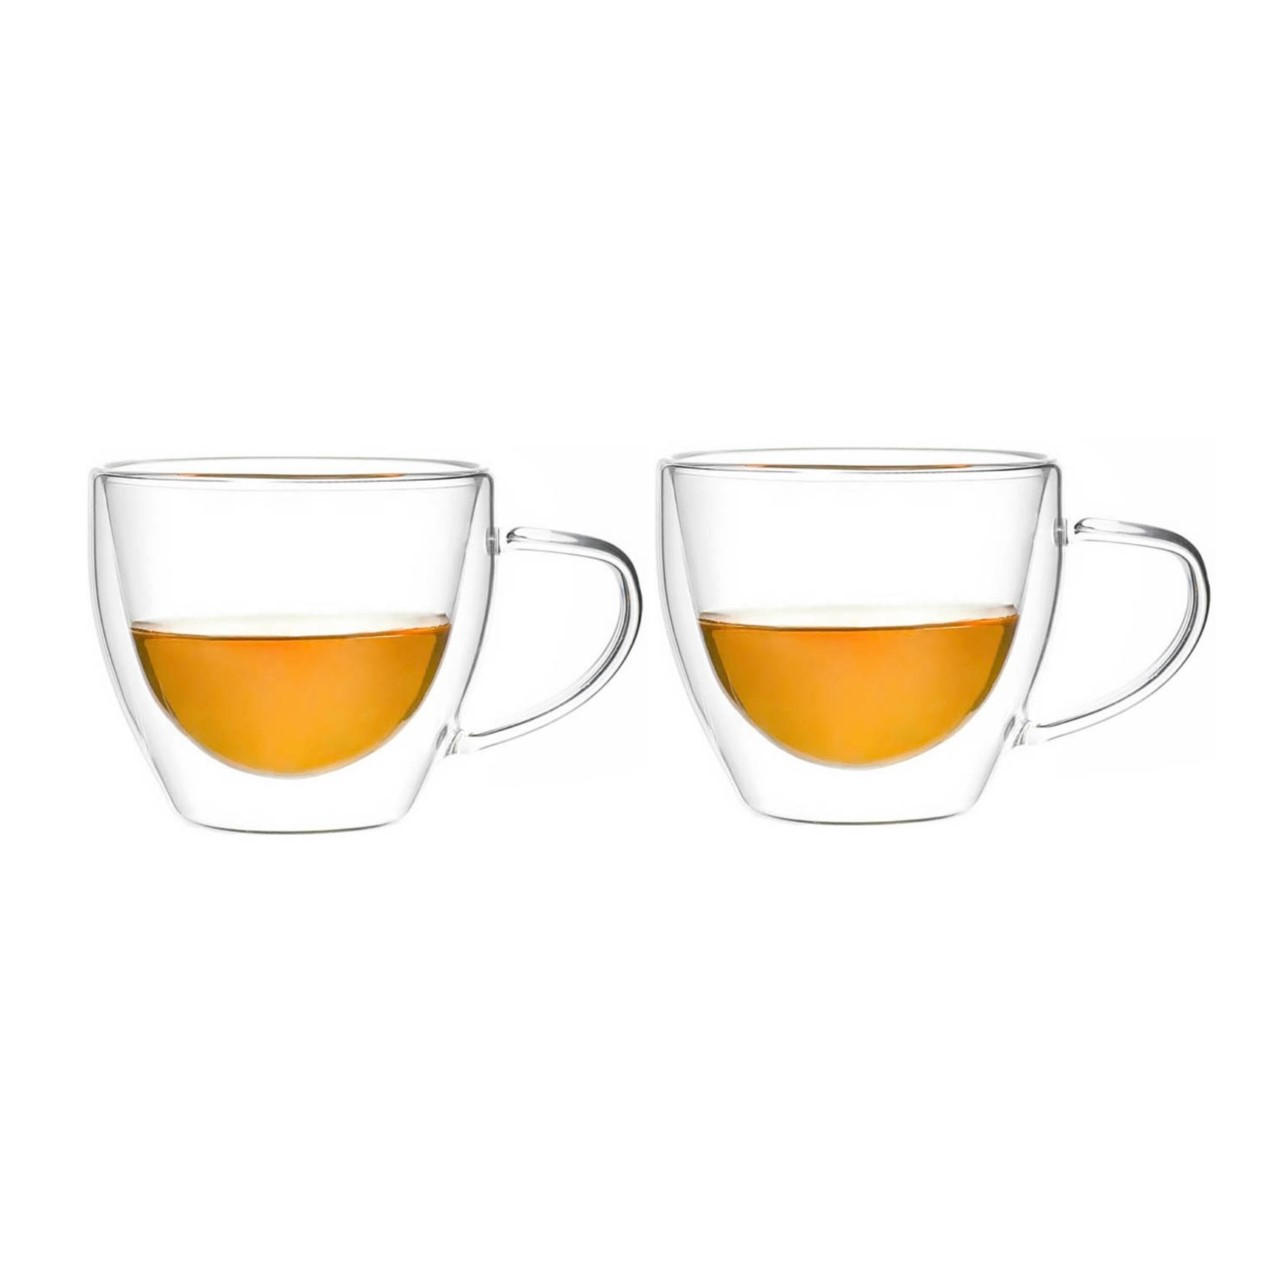 2 Chávenas vidro duplo